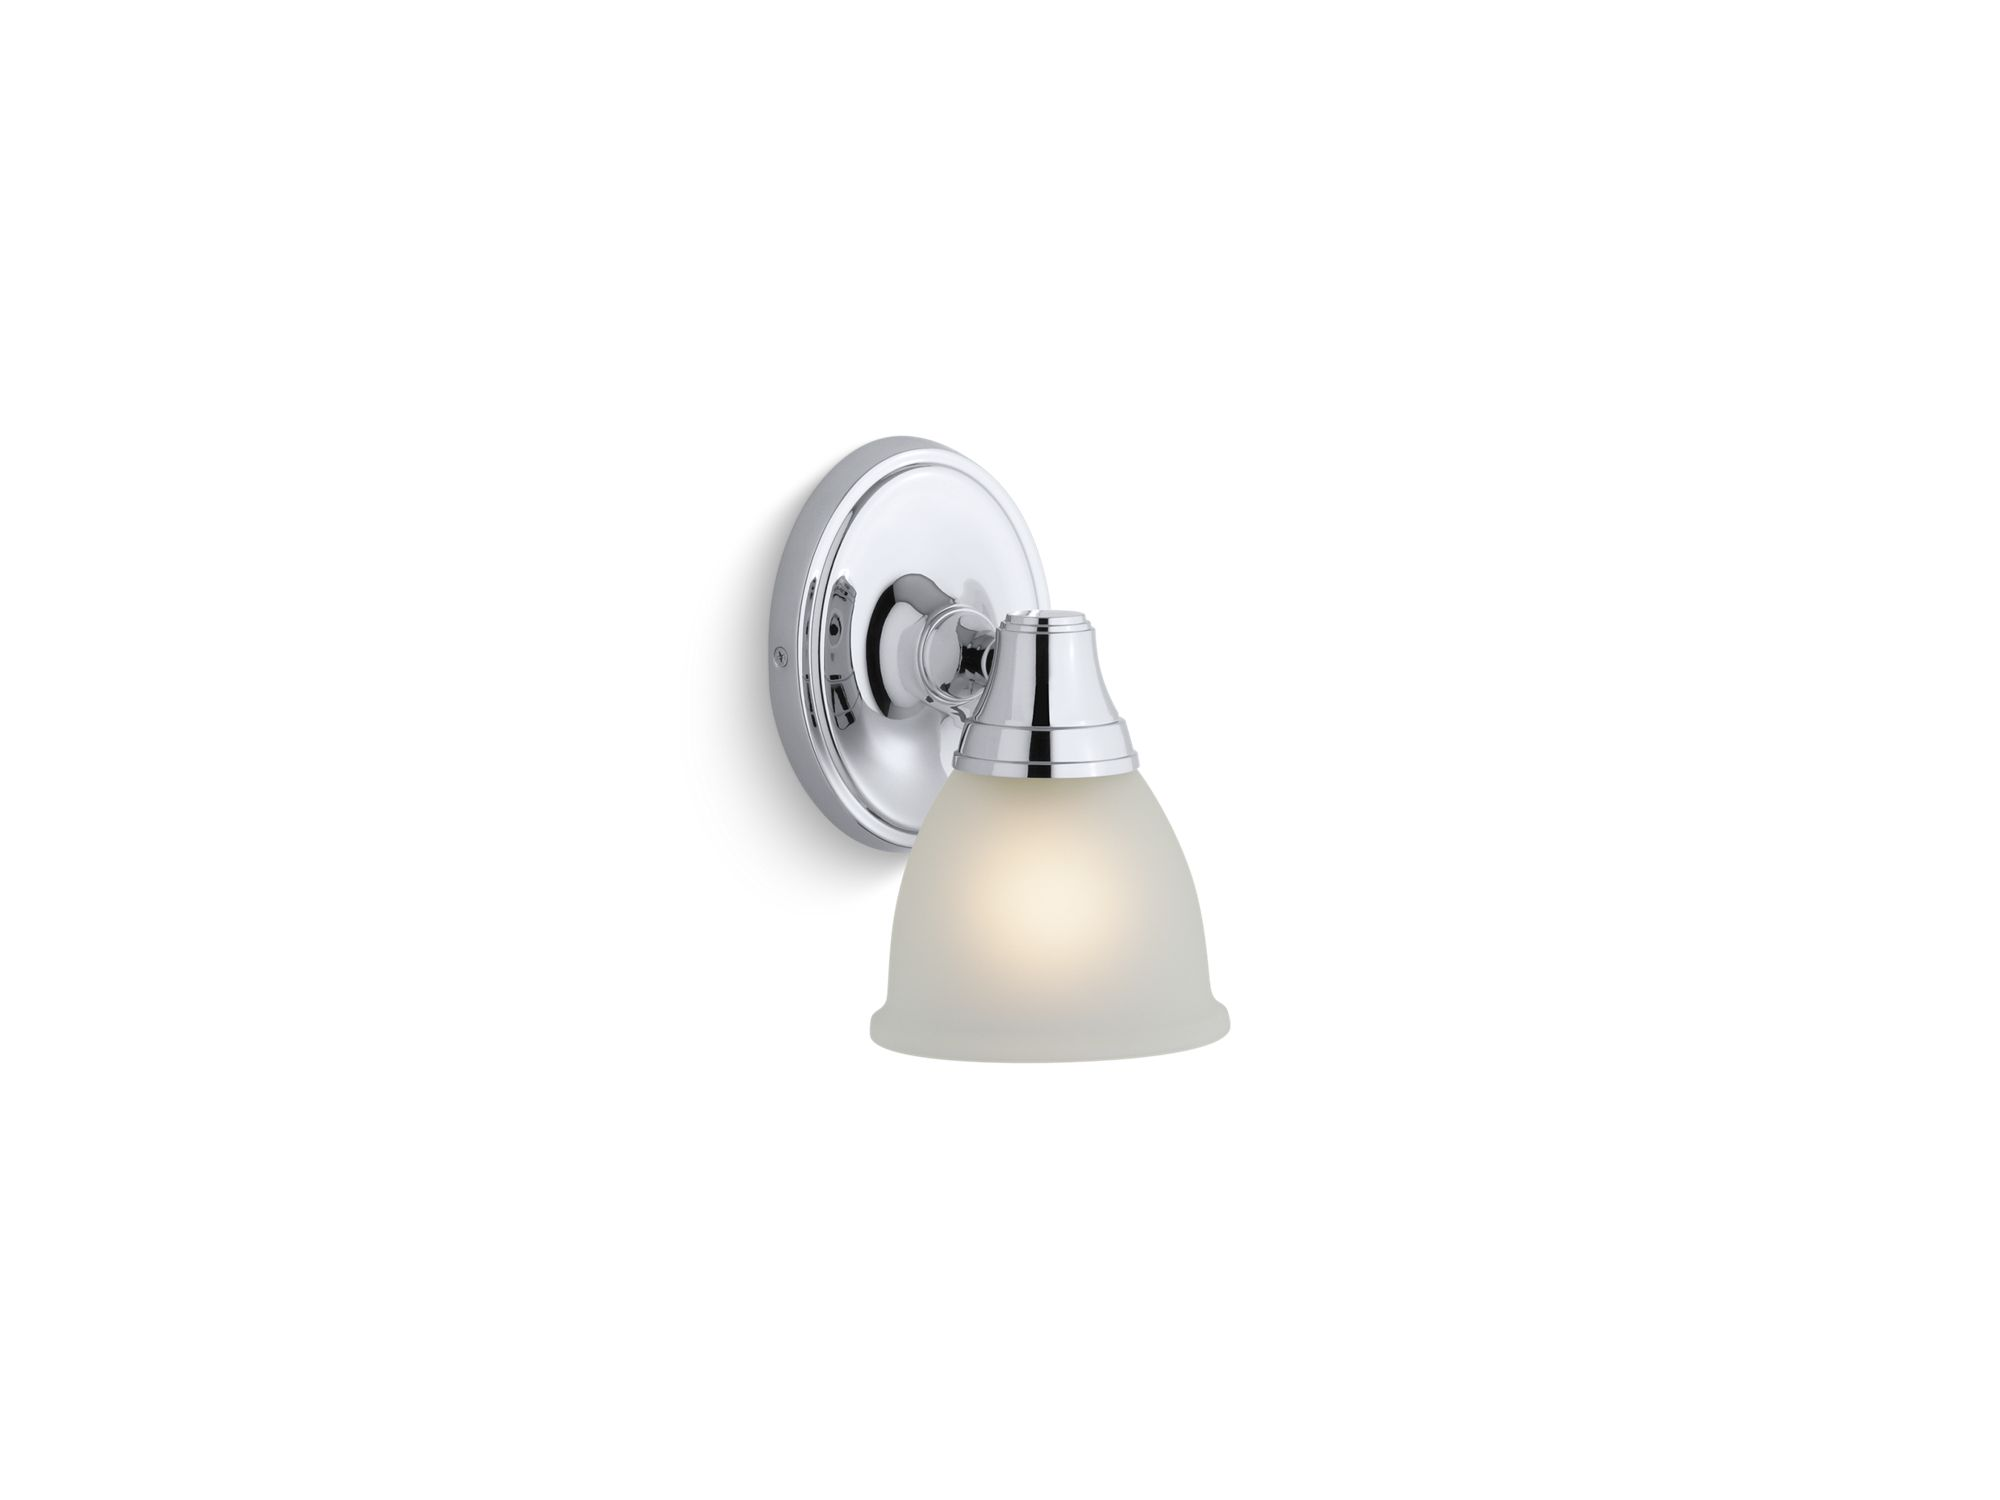 Kohler K-11365-CP Transitional Single Wall Sconce for Forté Faucet Line Polished Chrome